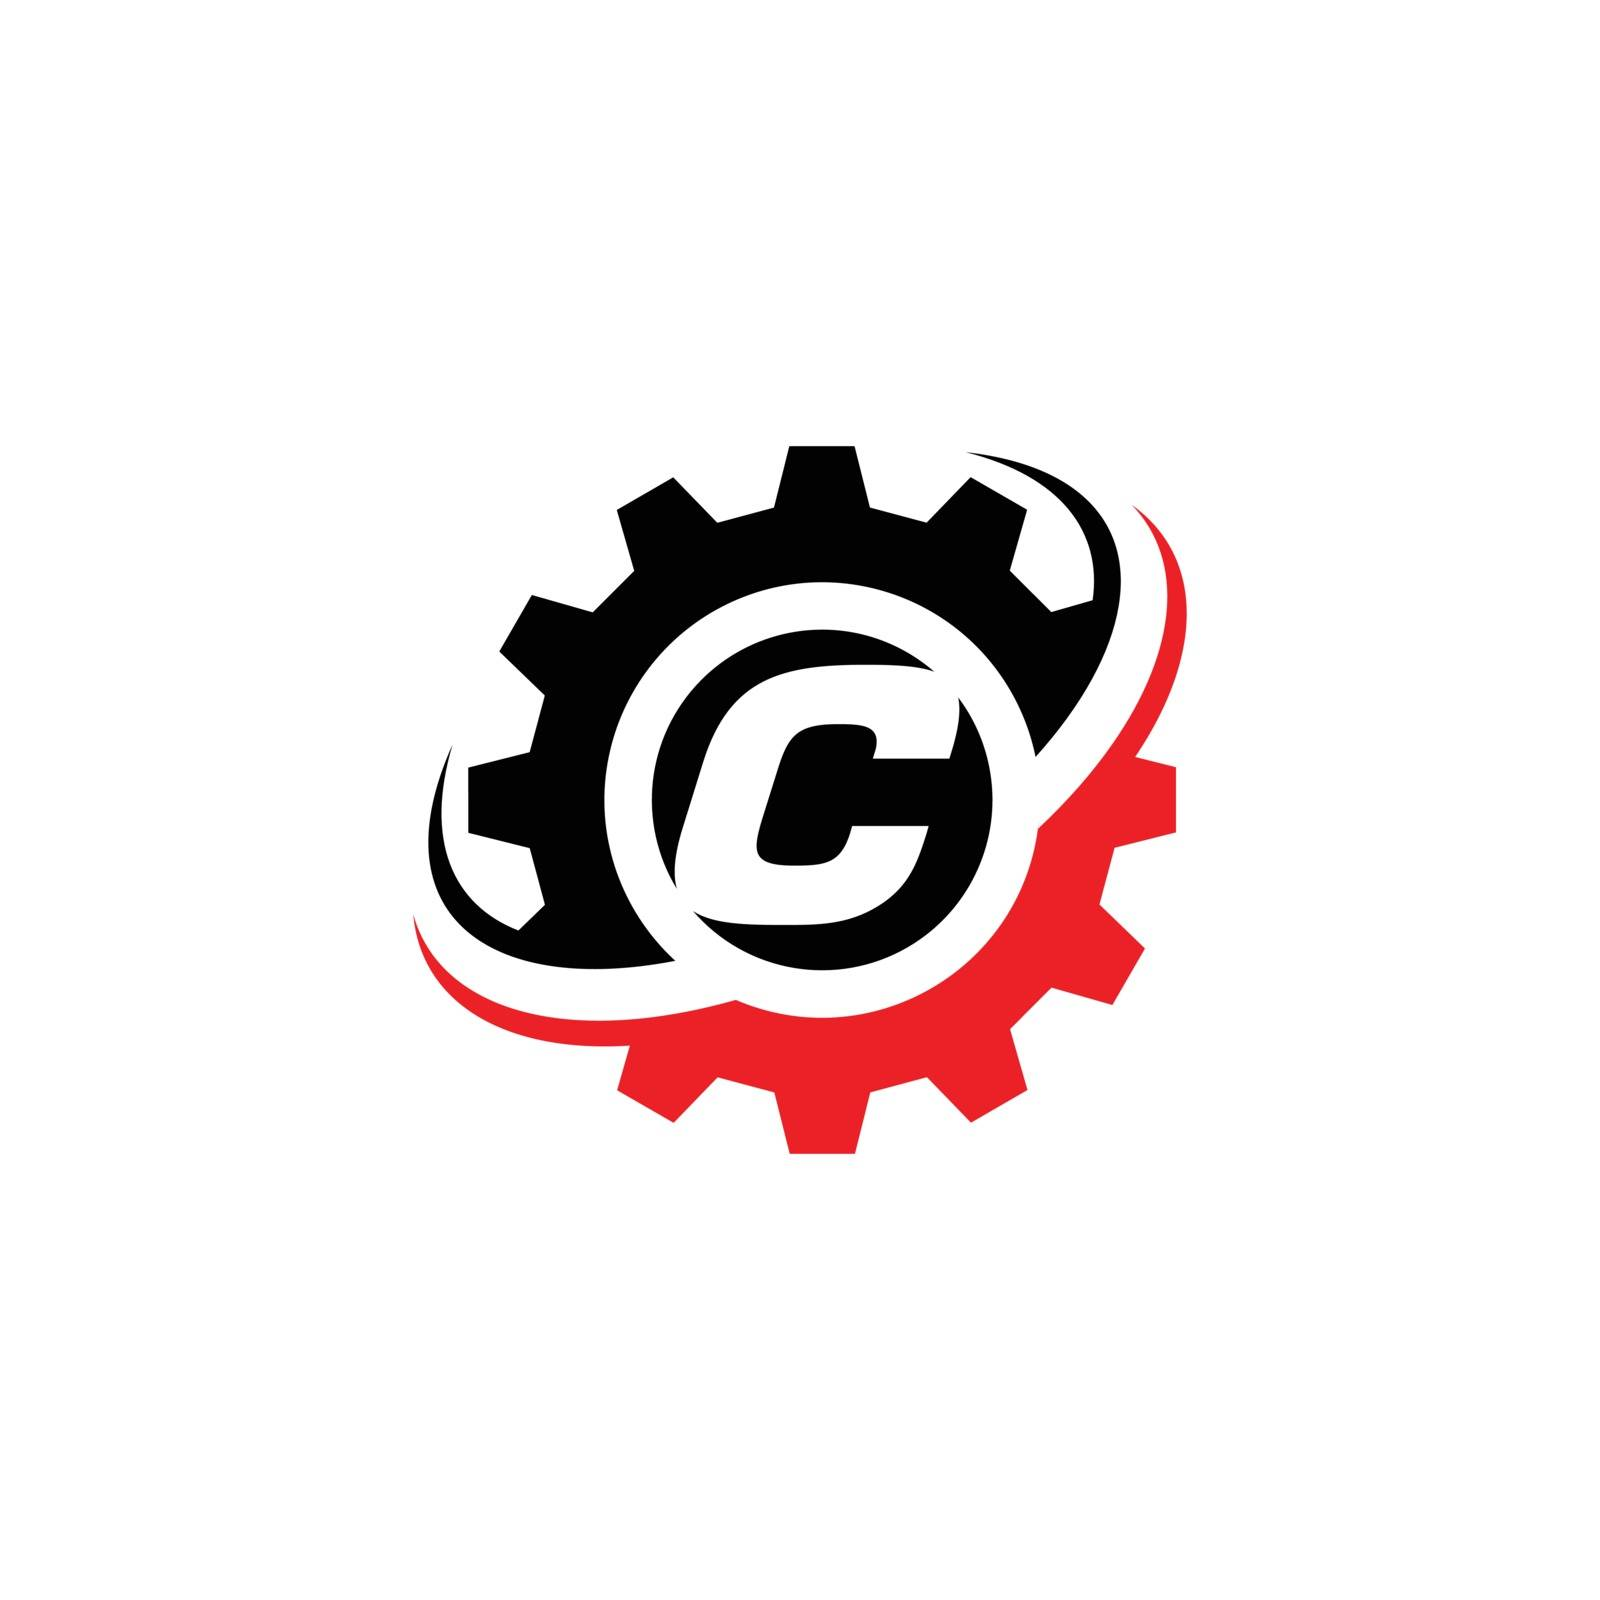 Letter C Gear Logo Design Template